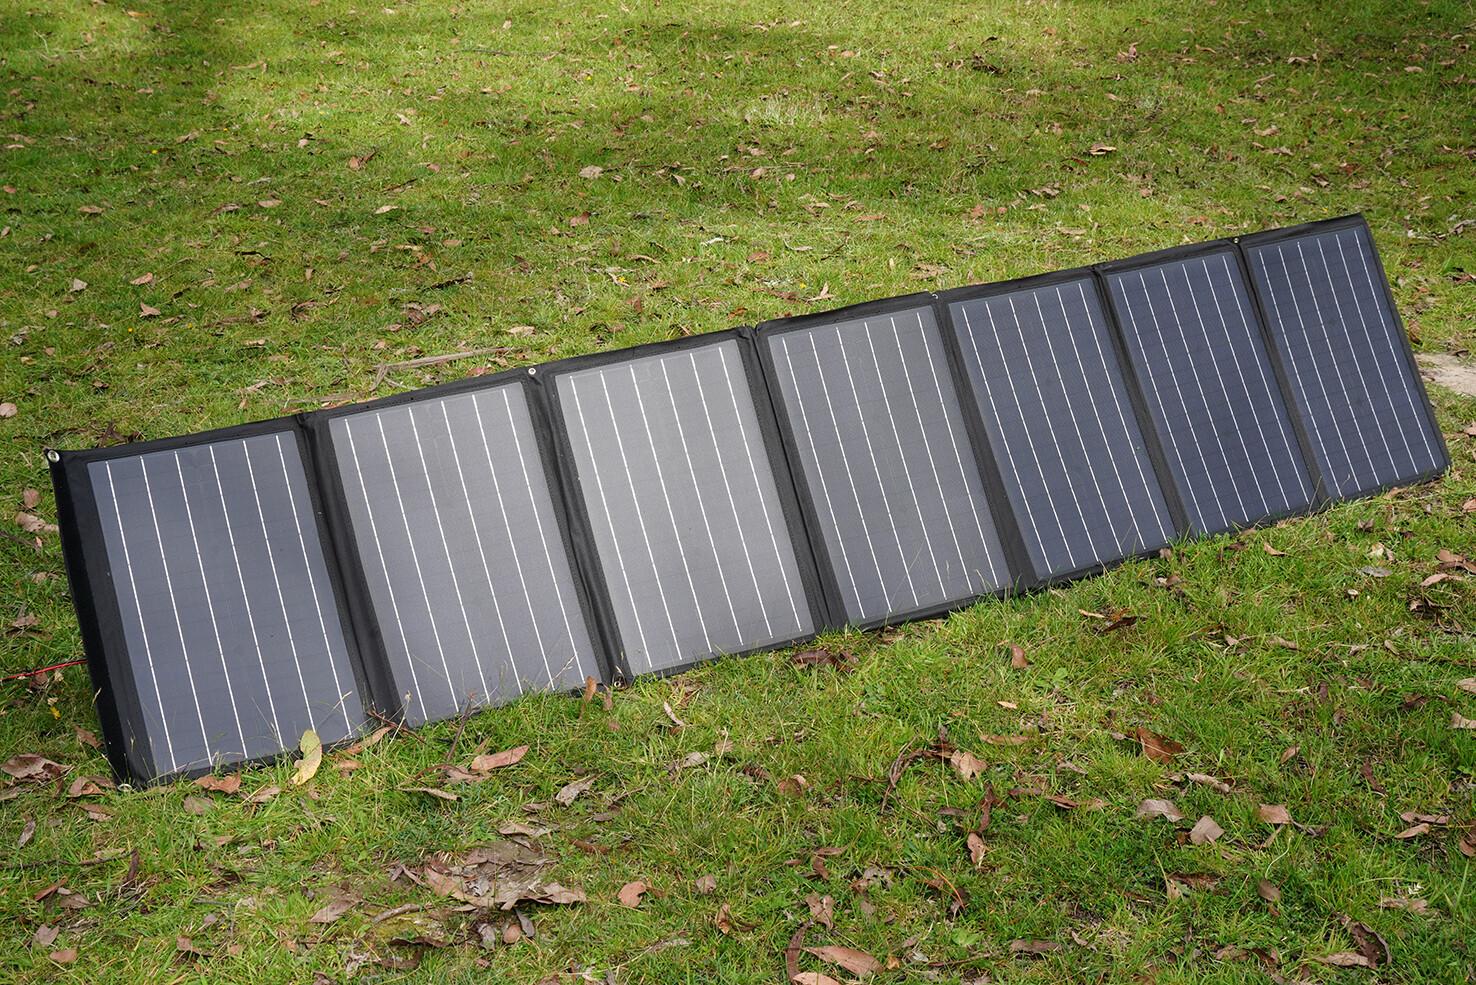 4 X 4 Australia Gear Projecta 180 W Solar Panel 3